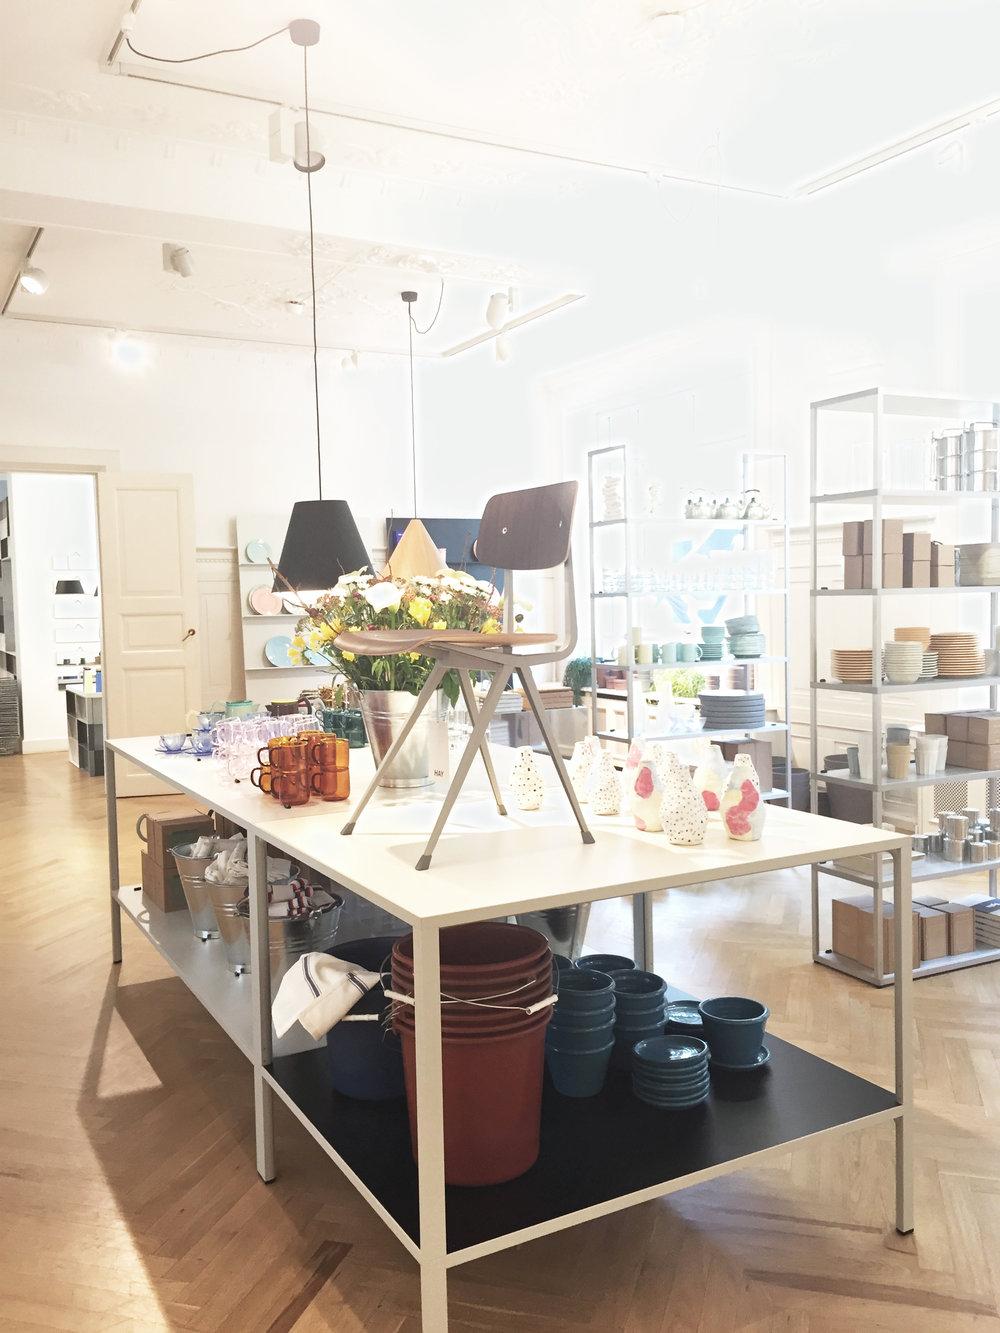 StudioGabrielle_Guide_Copenhagen_StylistEye_HayHouse